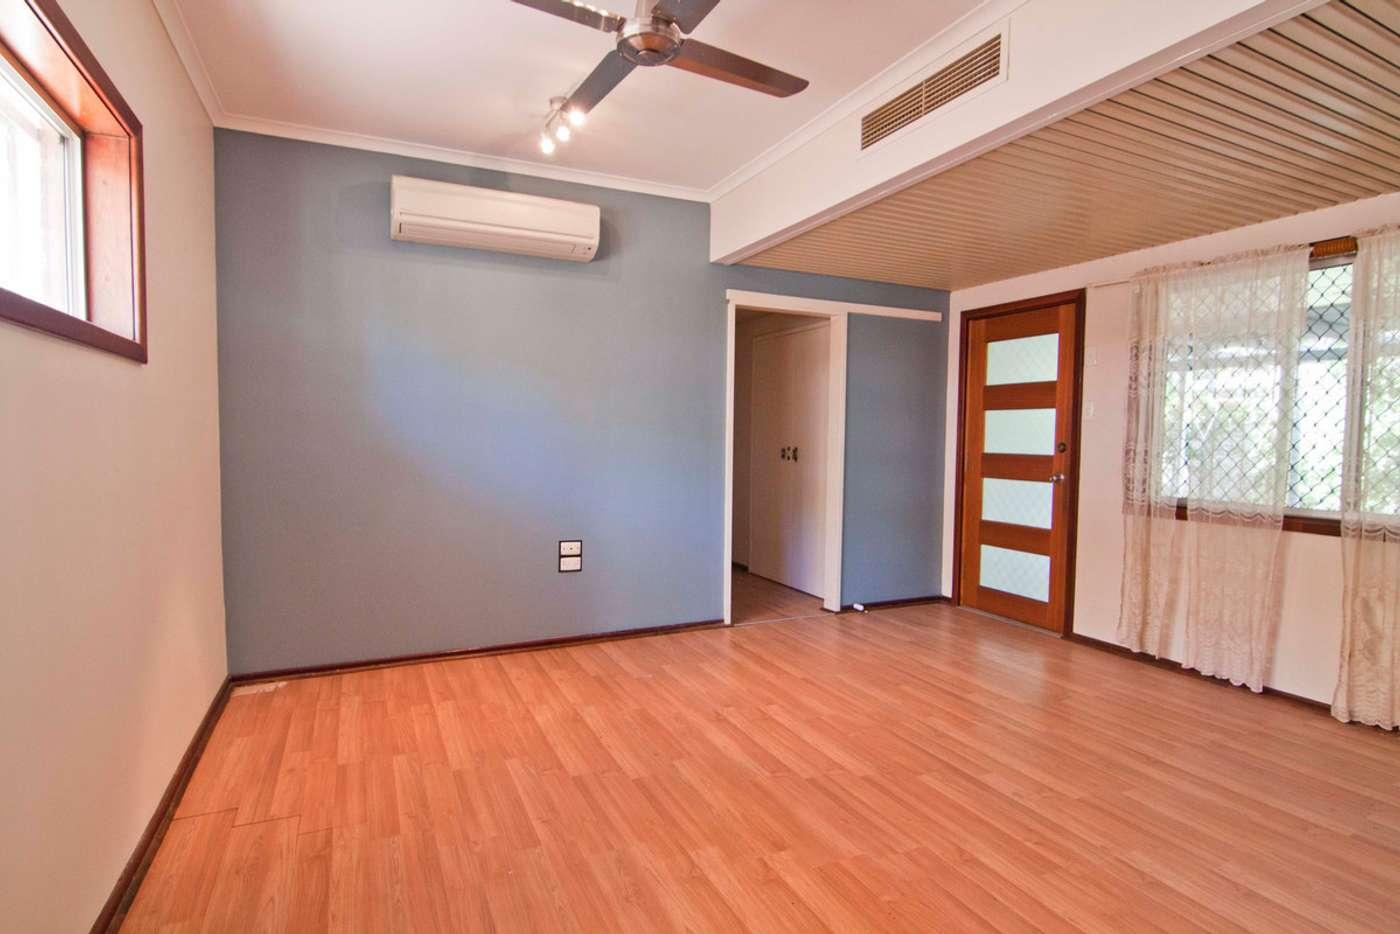 Seventh view of Homely house listing, 33 Eucalyptus Close, Kununurra WA 6743